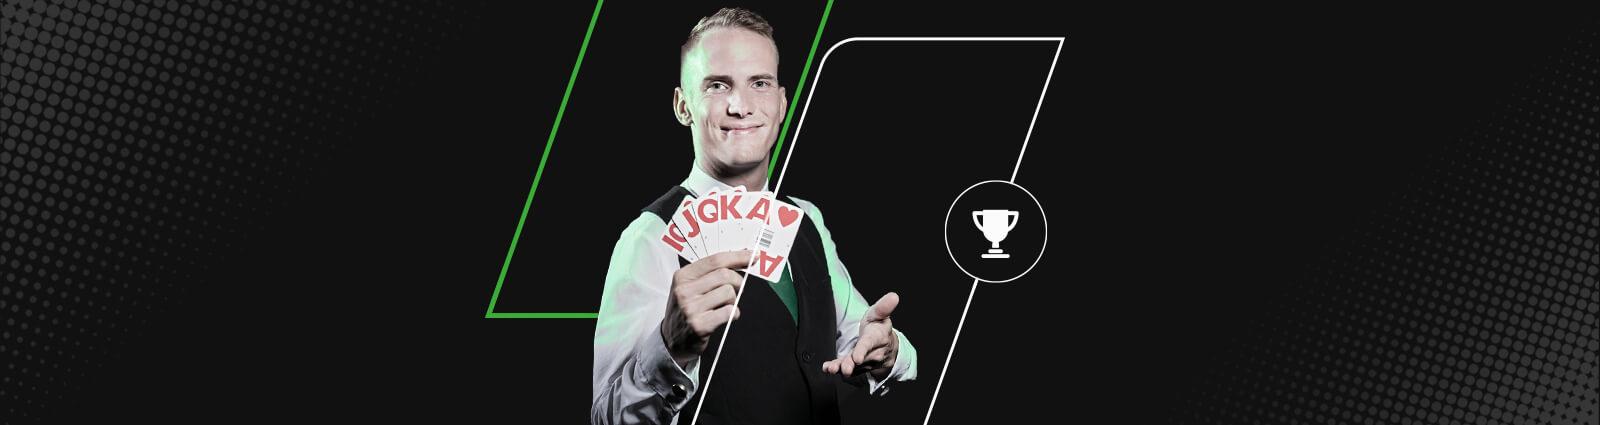 unibet_casino_challenge_3